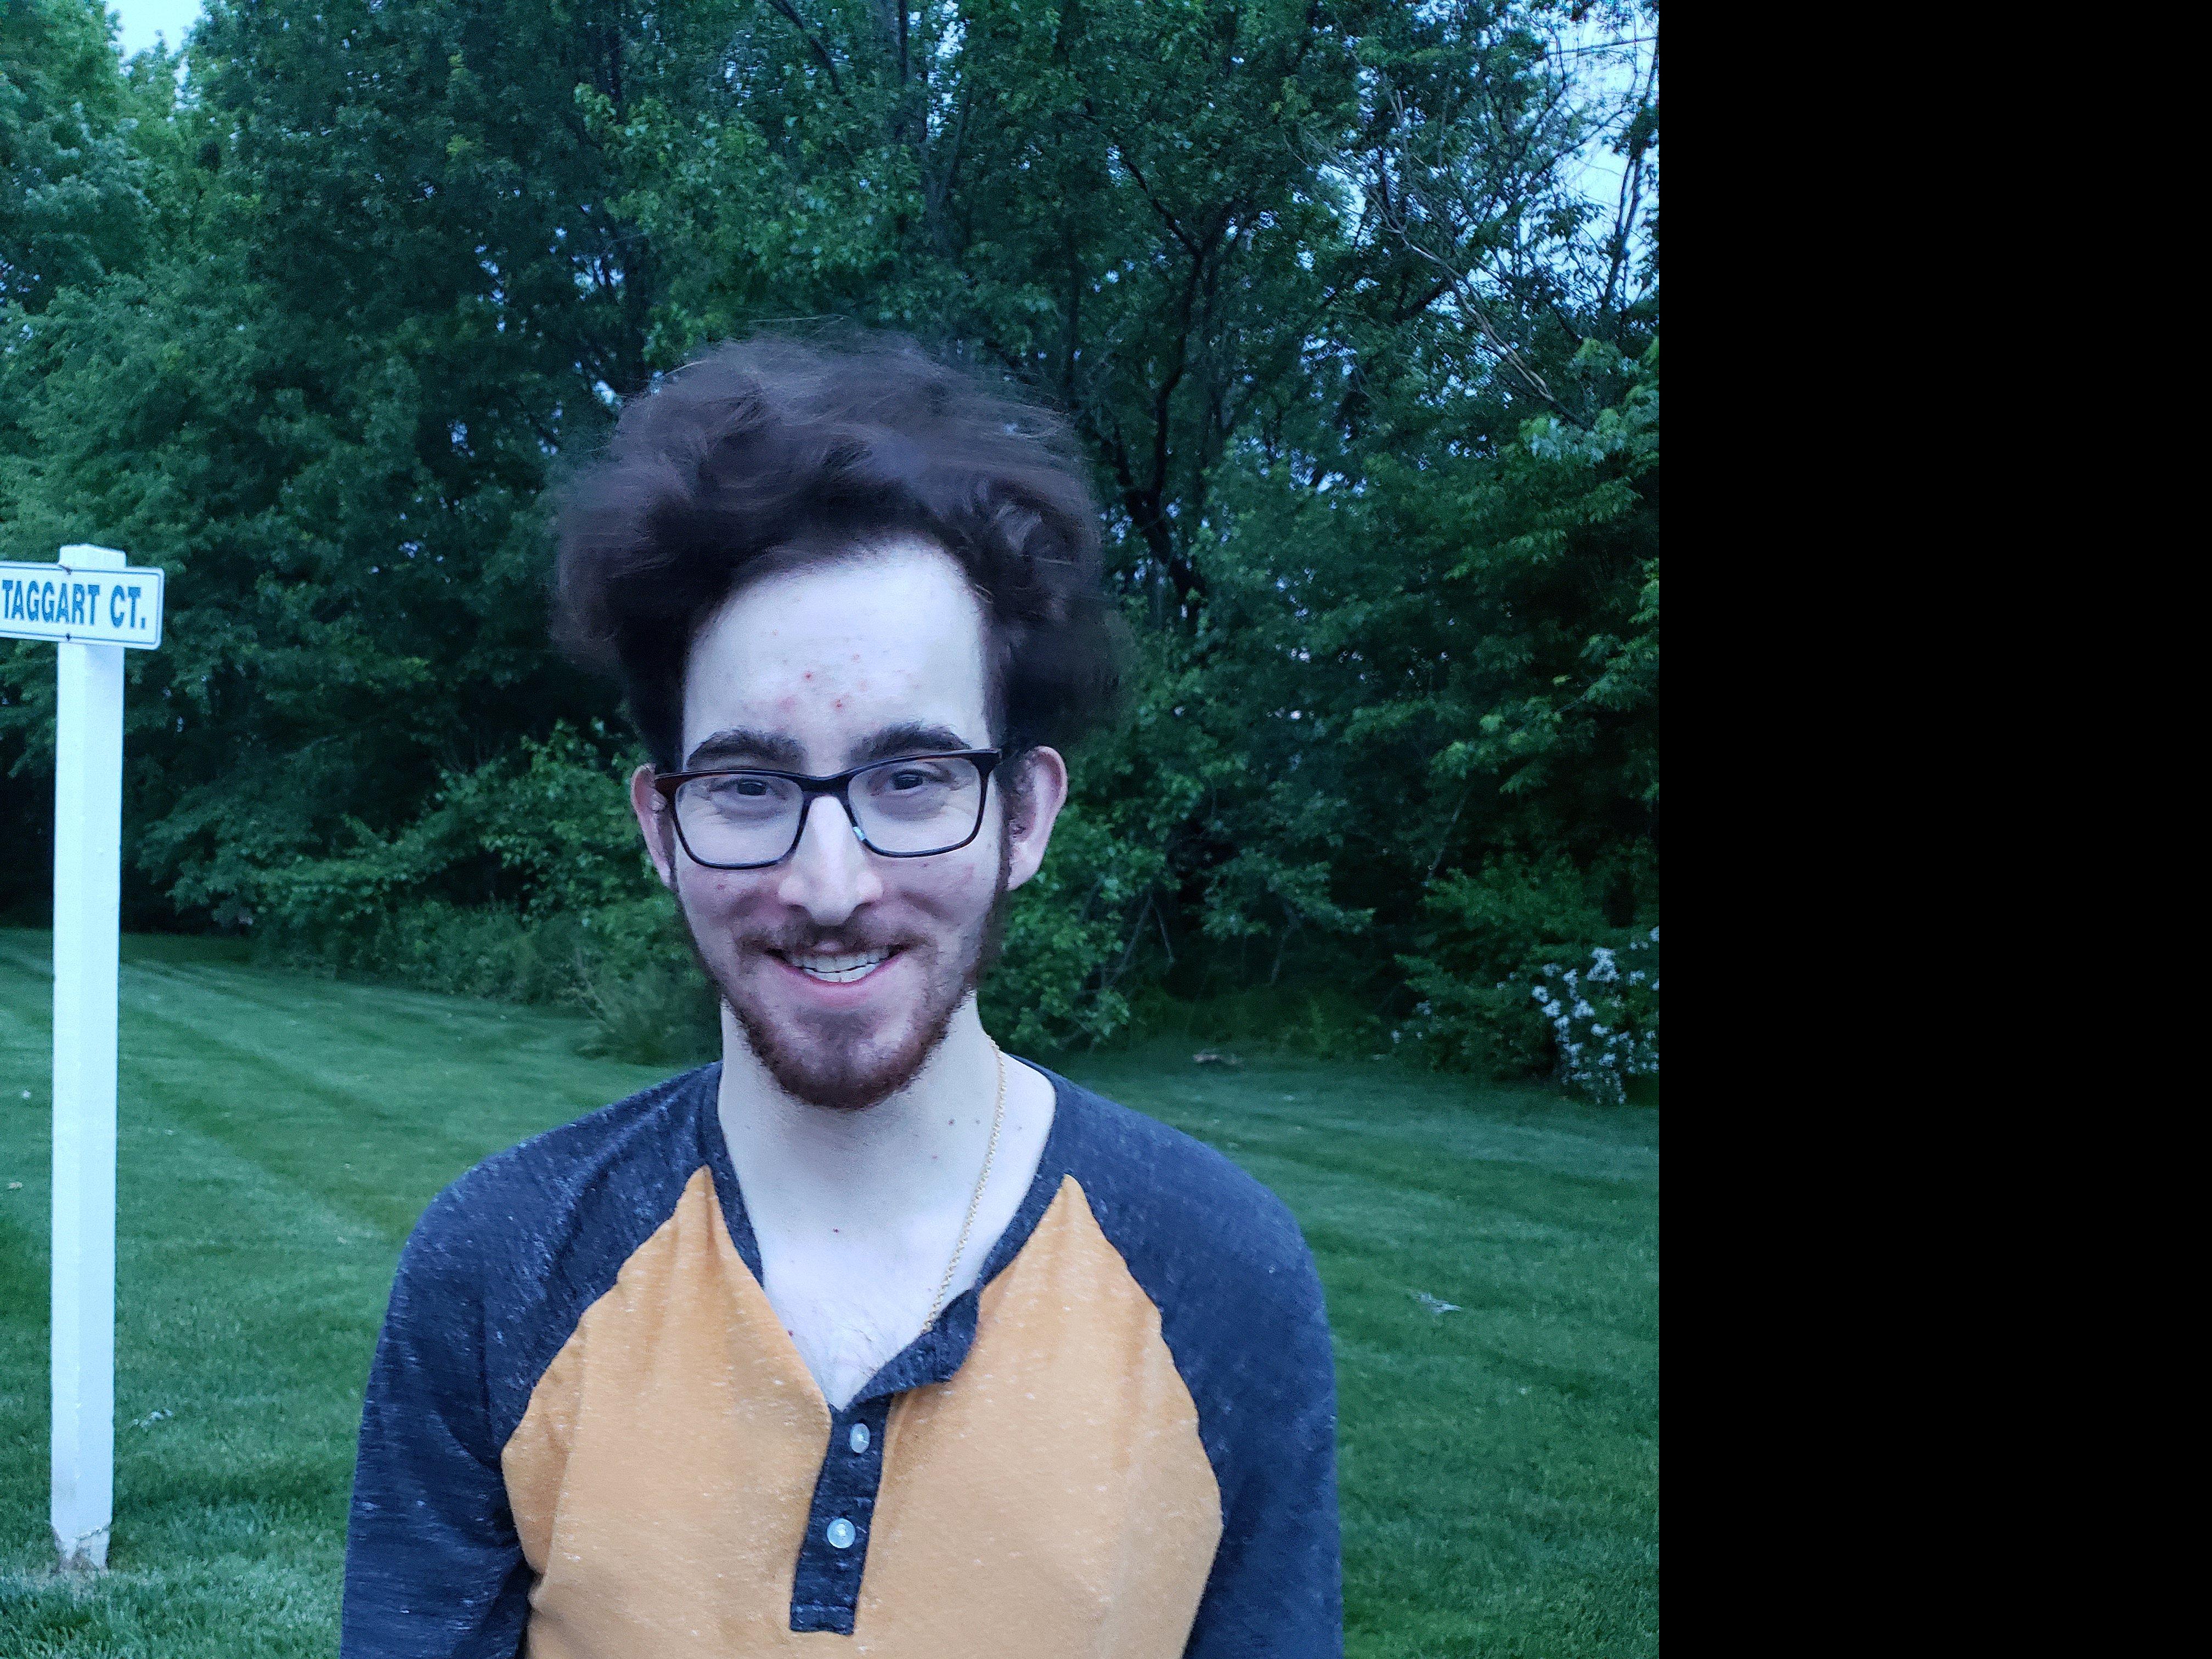 Hair 2020